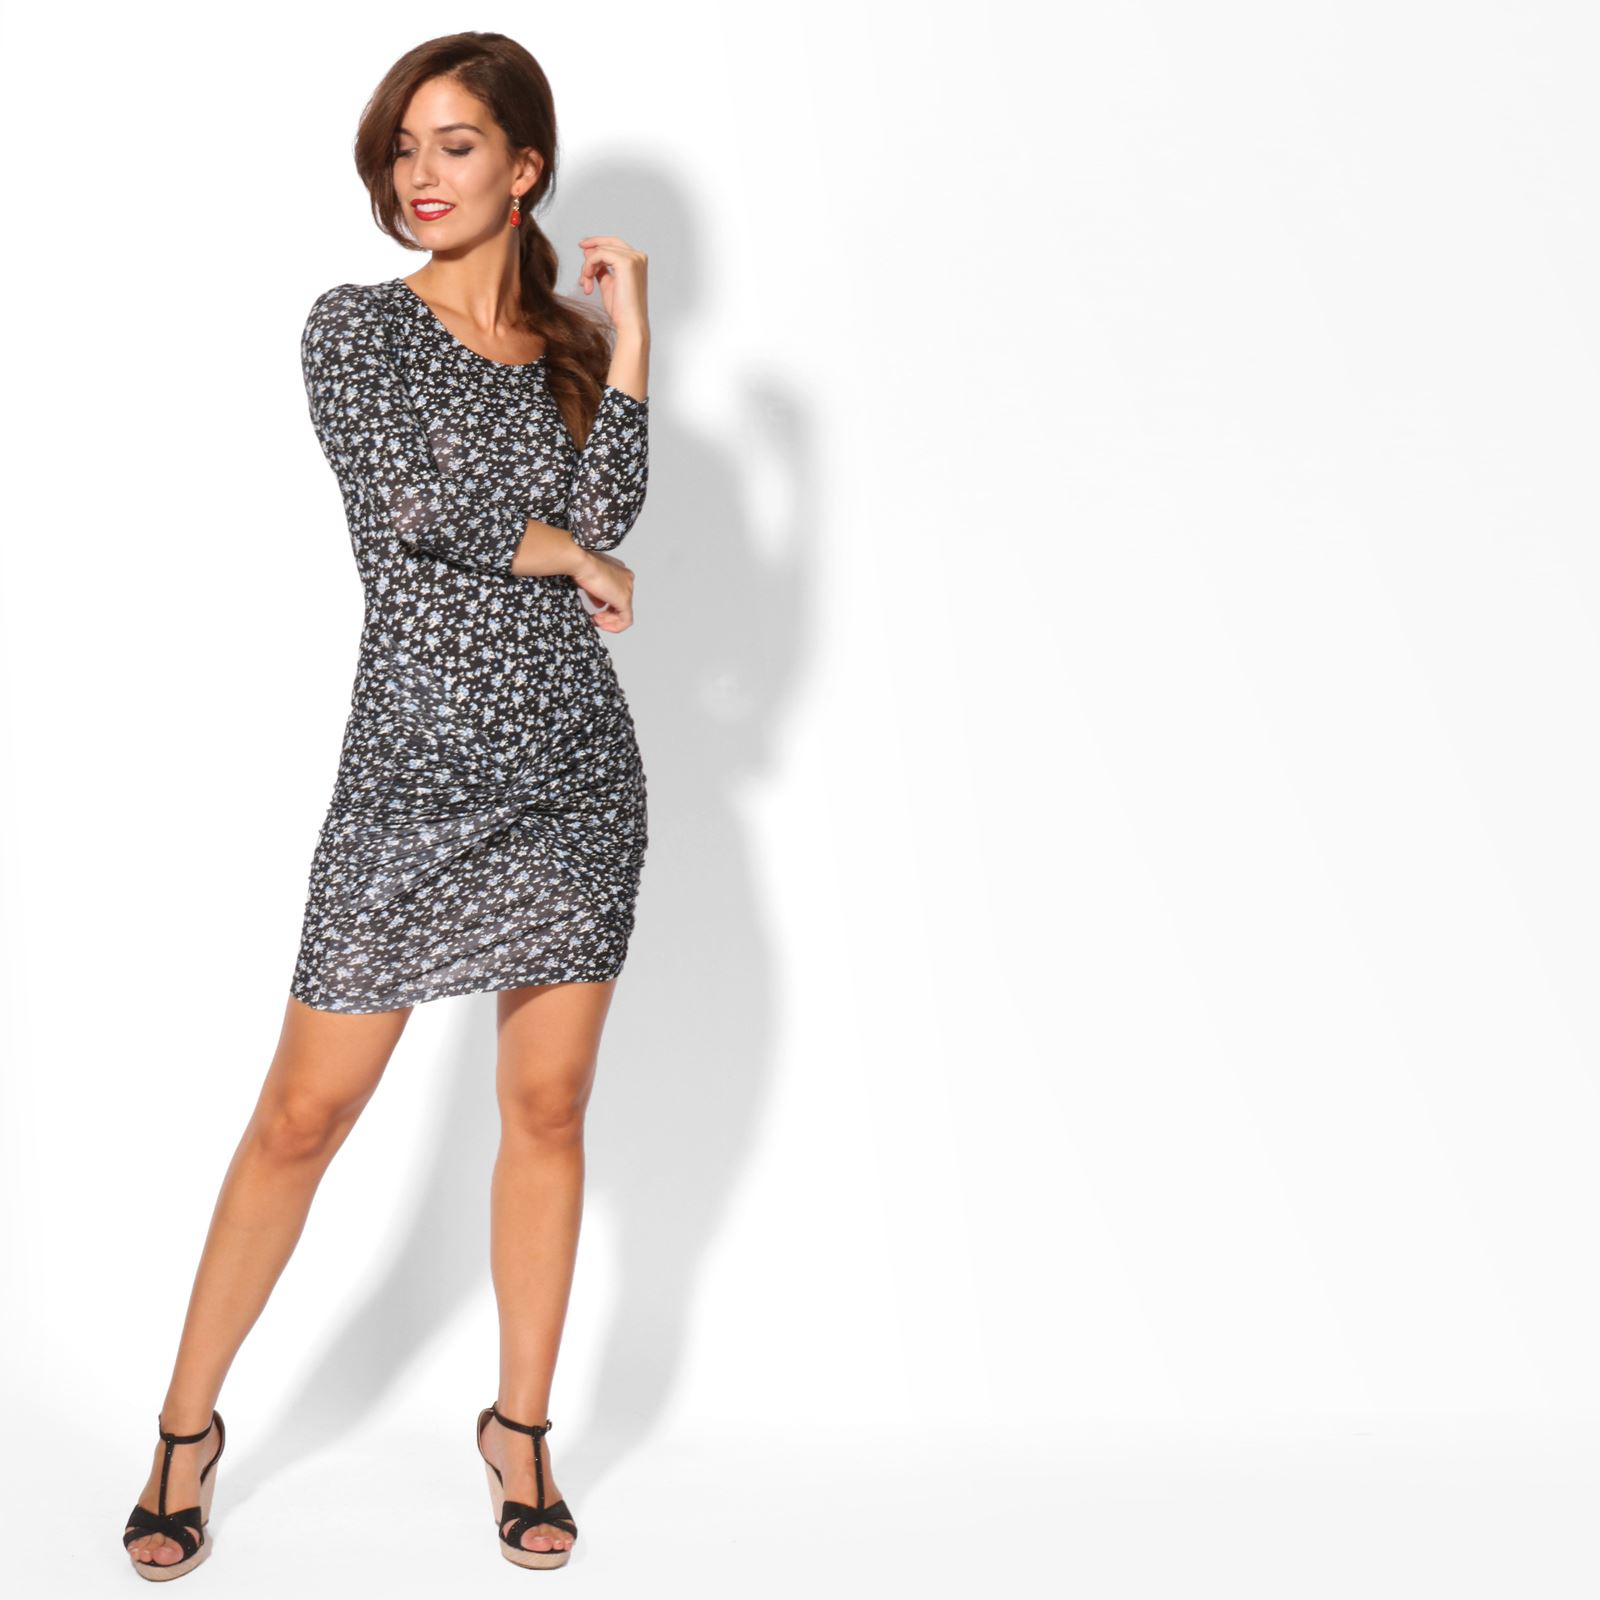 KRISP-Women-2-in-1-Boho-Gypsy-Tunic-Dress-Top-Tee-Jersey-Pleated-A-Line-Necklace thumbnail 3